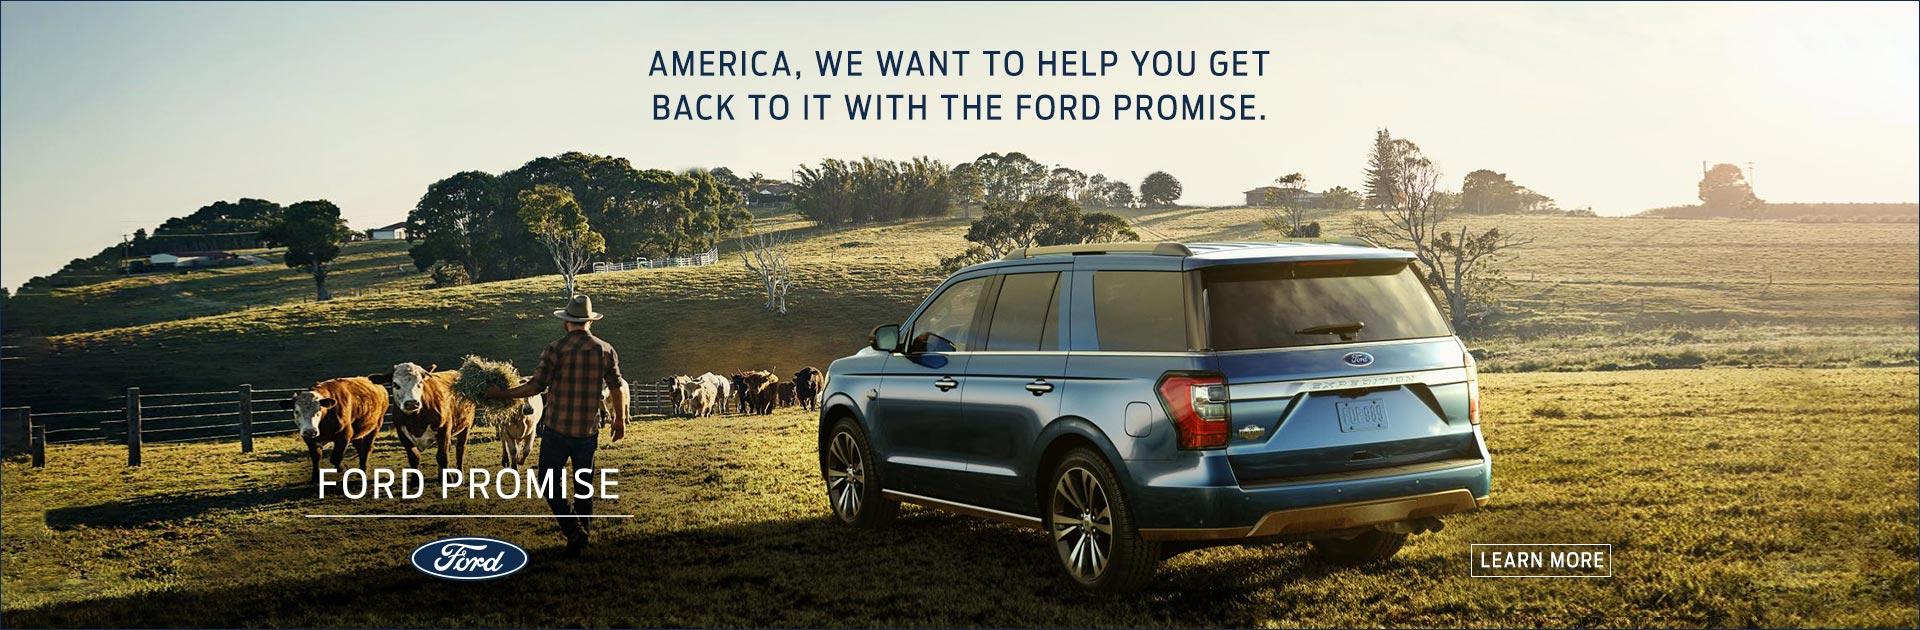 2020 Junjulaugsep Fordpromise Jaz 1920x6301